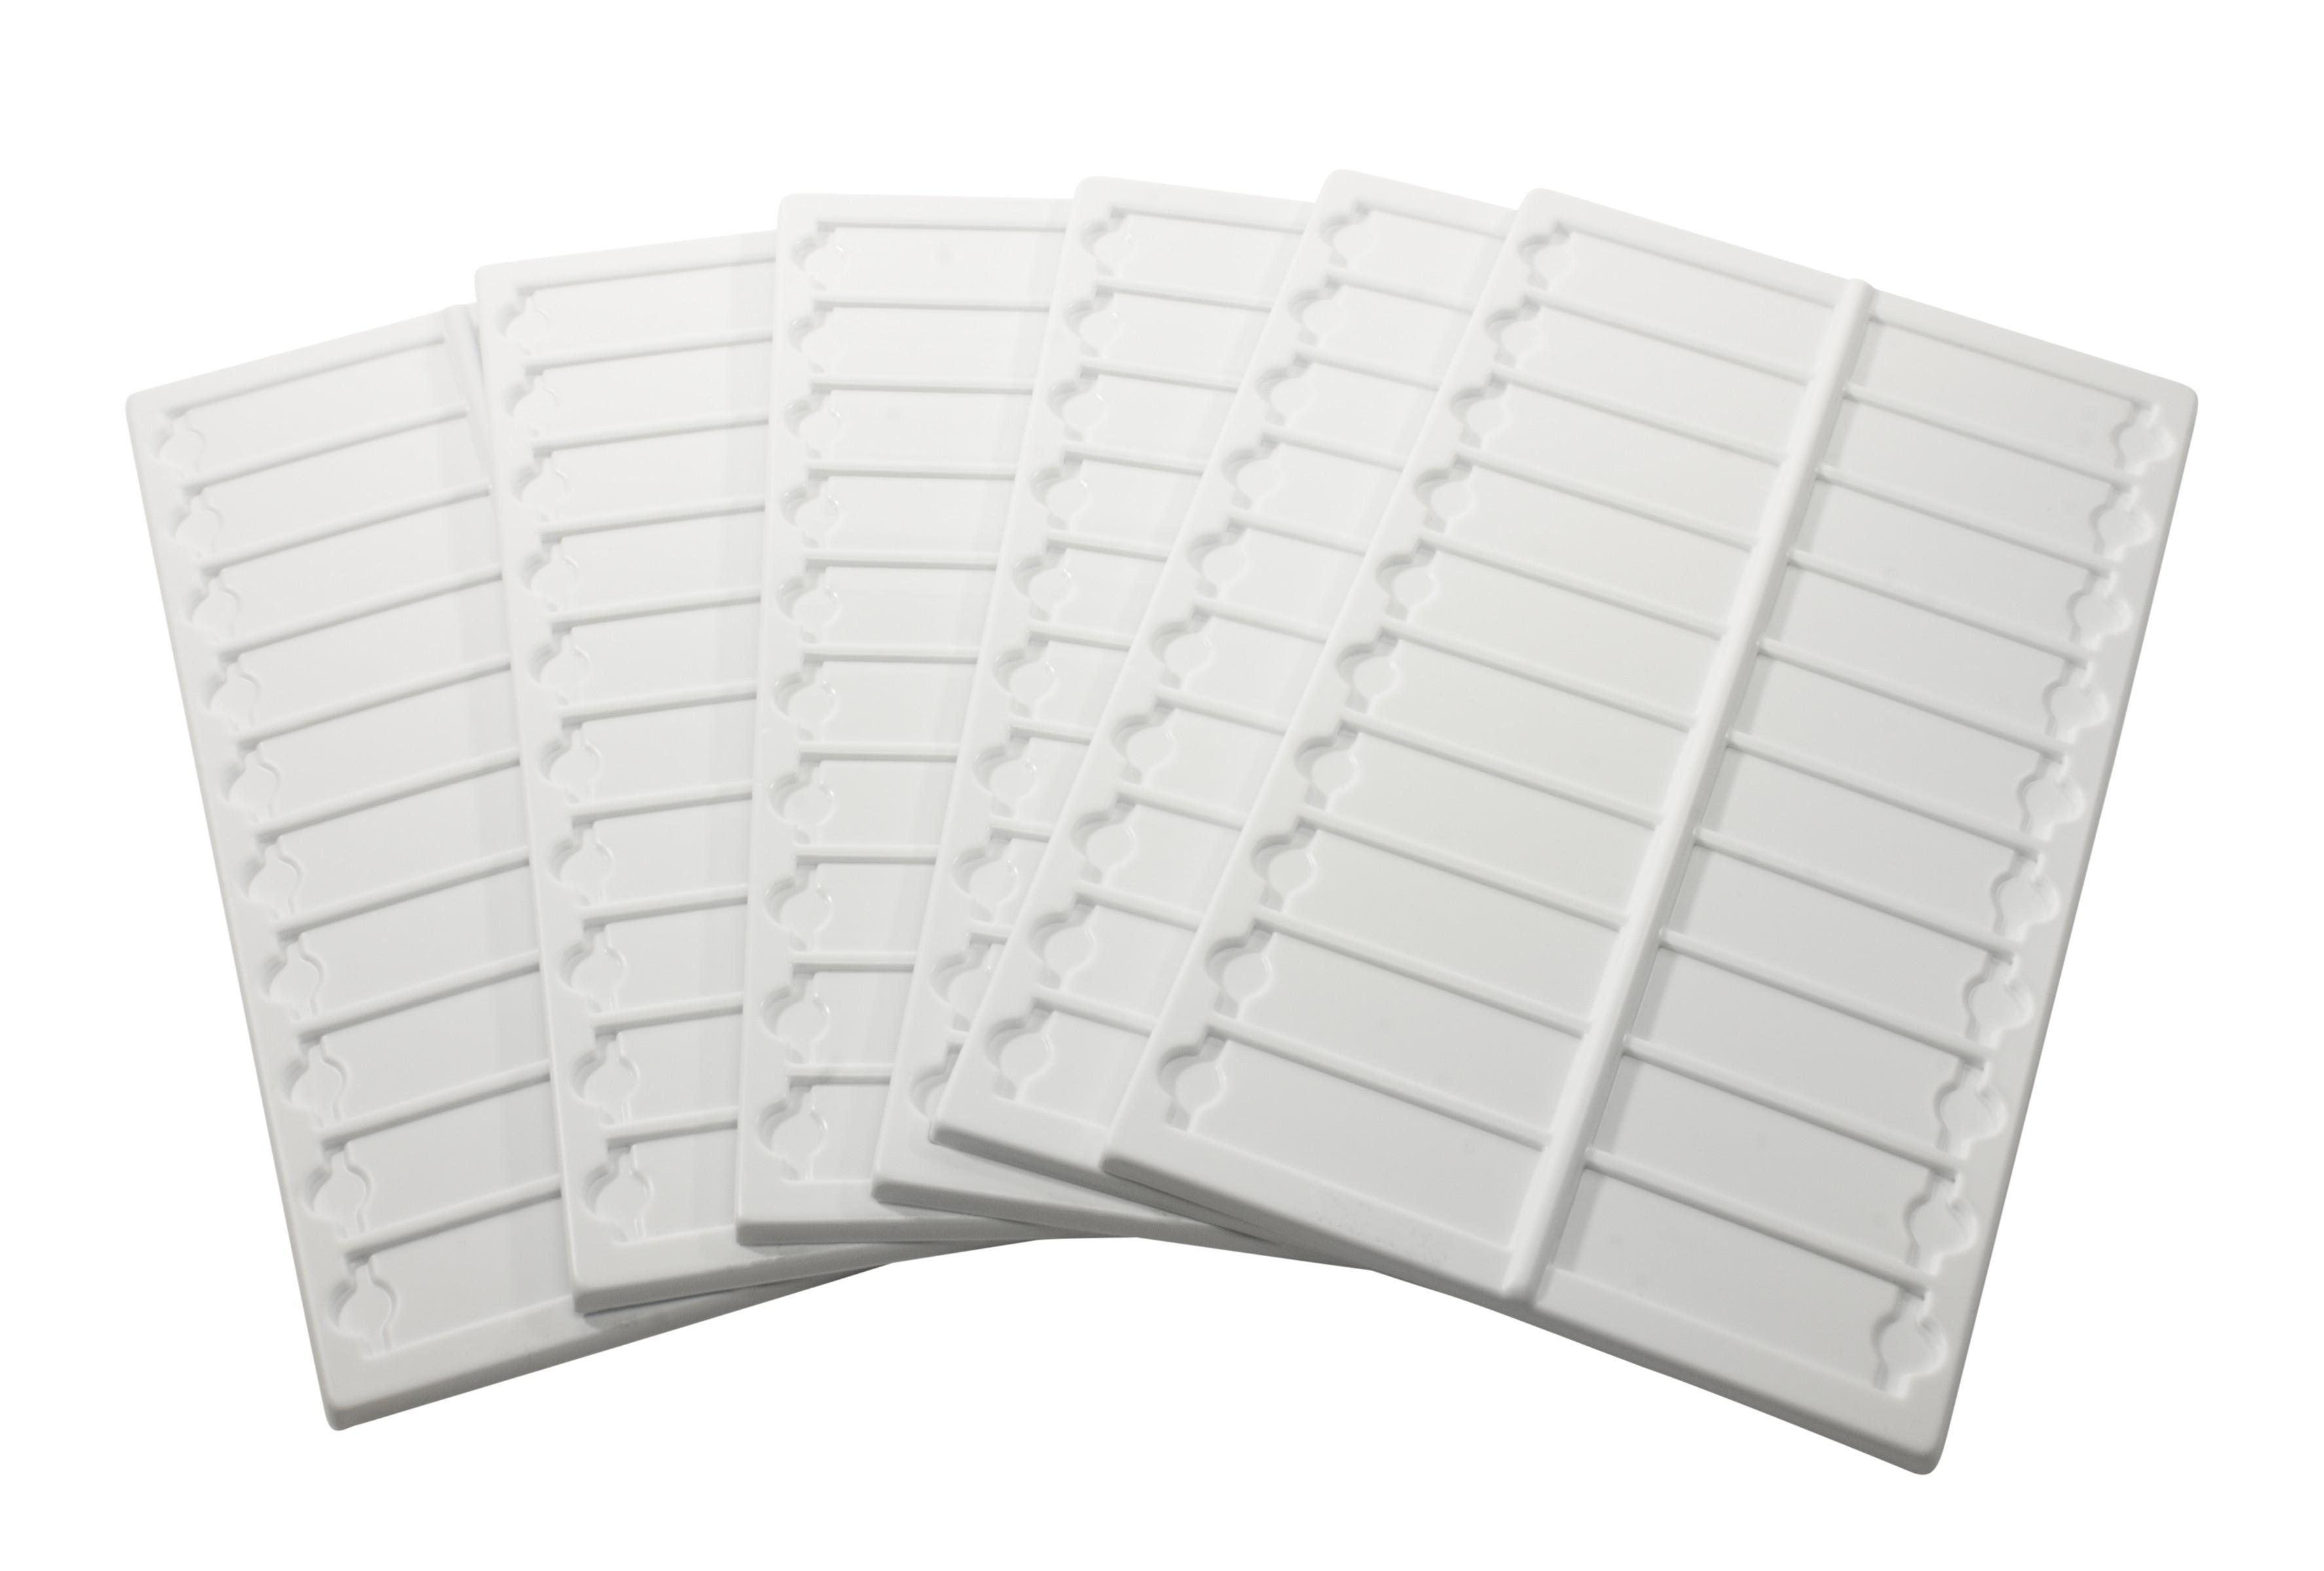 Bel-Art Microscope Slide Tray; 20 Capacity, 13½ x 6 ⅝ in., Plastic (Pack of 6)